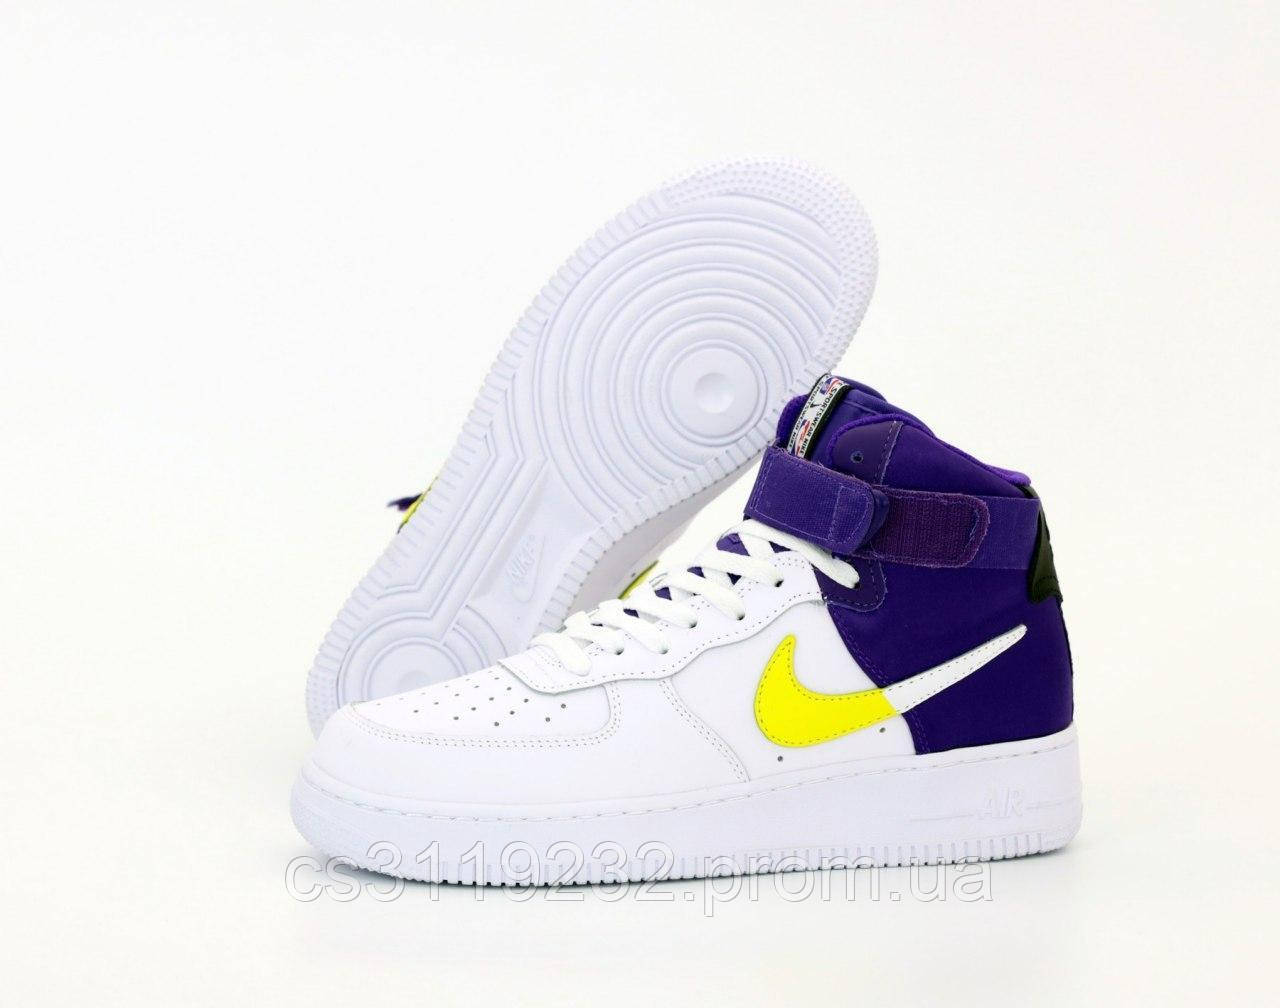 Мужские кроссовки Nike Air Force 1 High Violet White (фиолетово-белые)